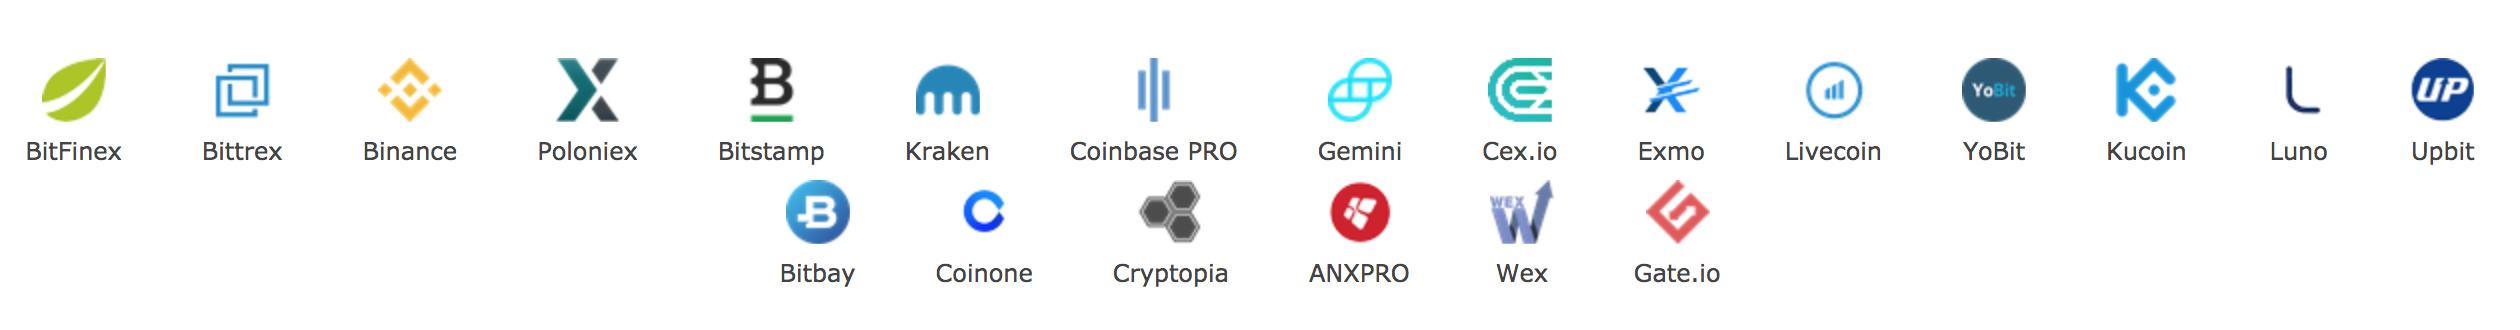 Exchange Integration | MultiTrader - Smart Cryptocurrency Arbitrage